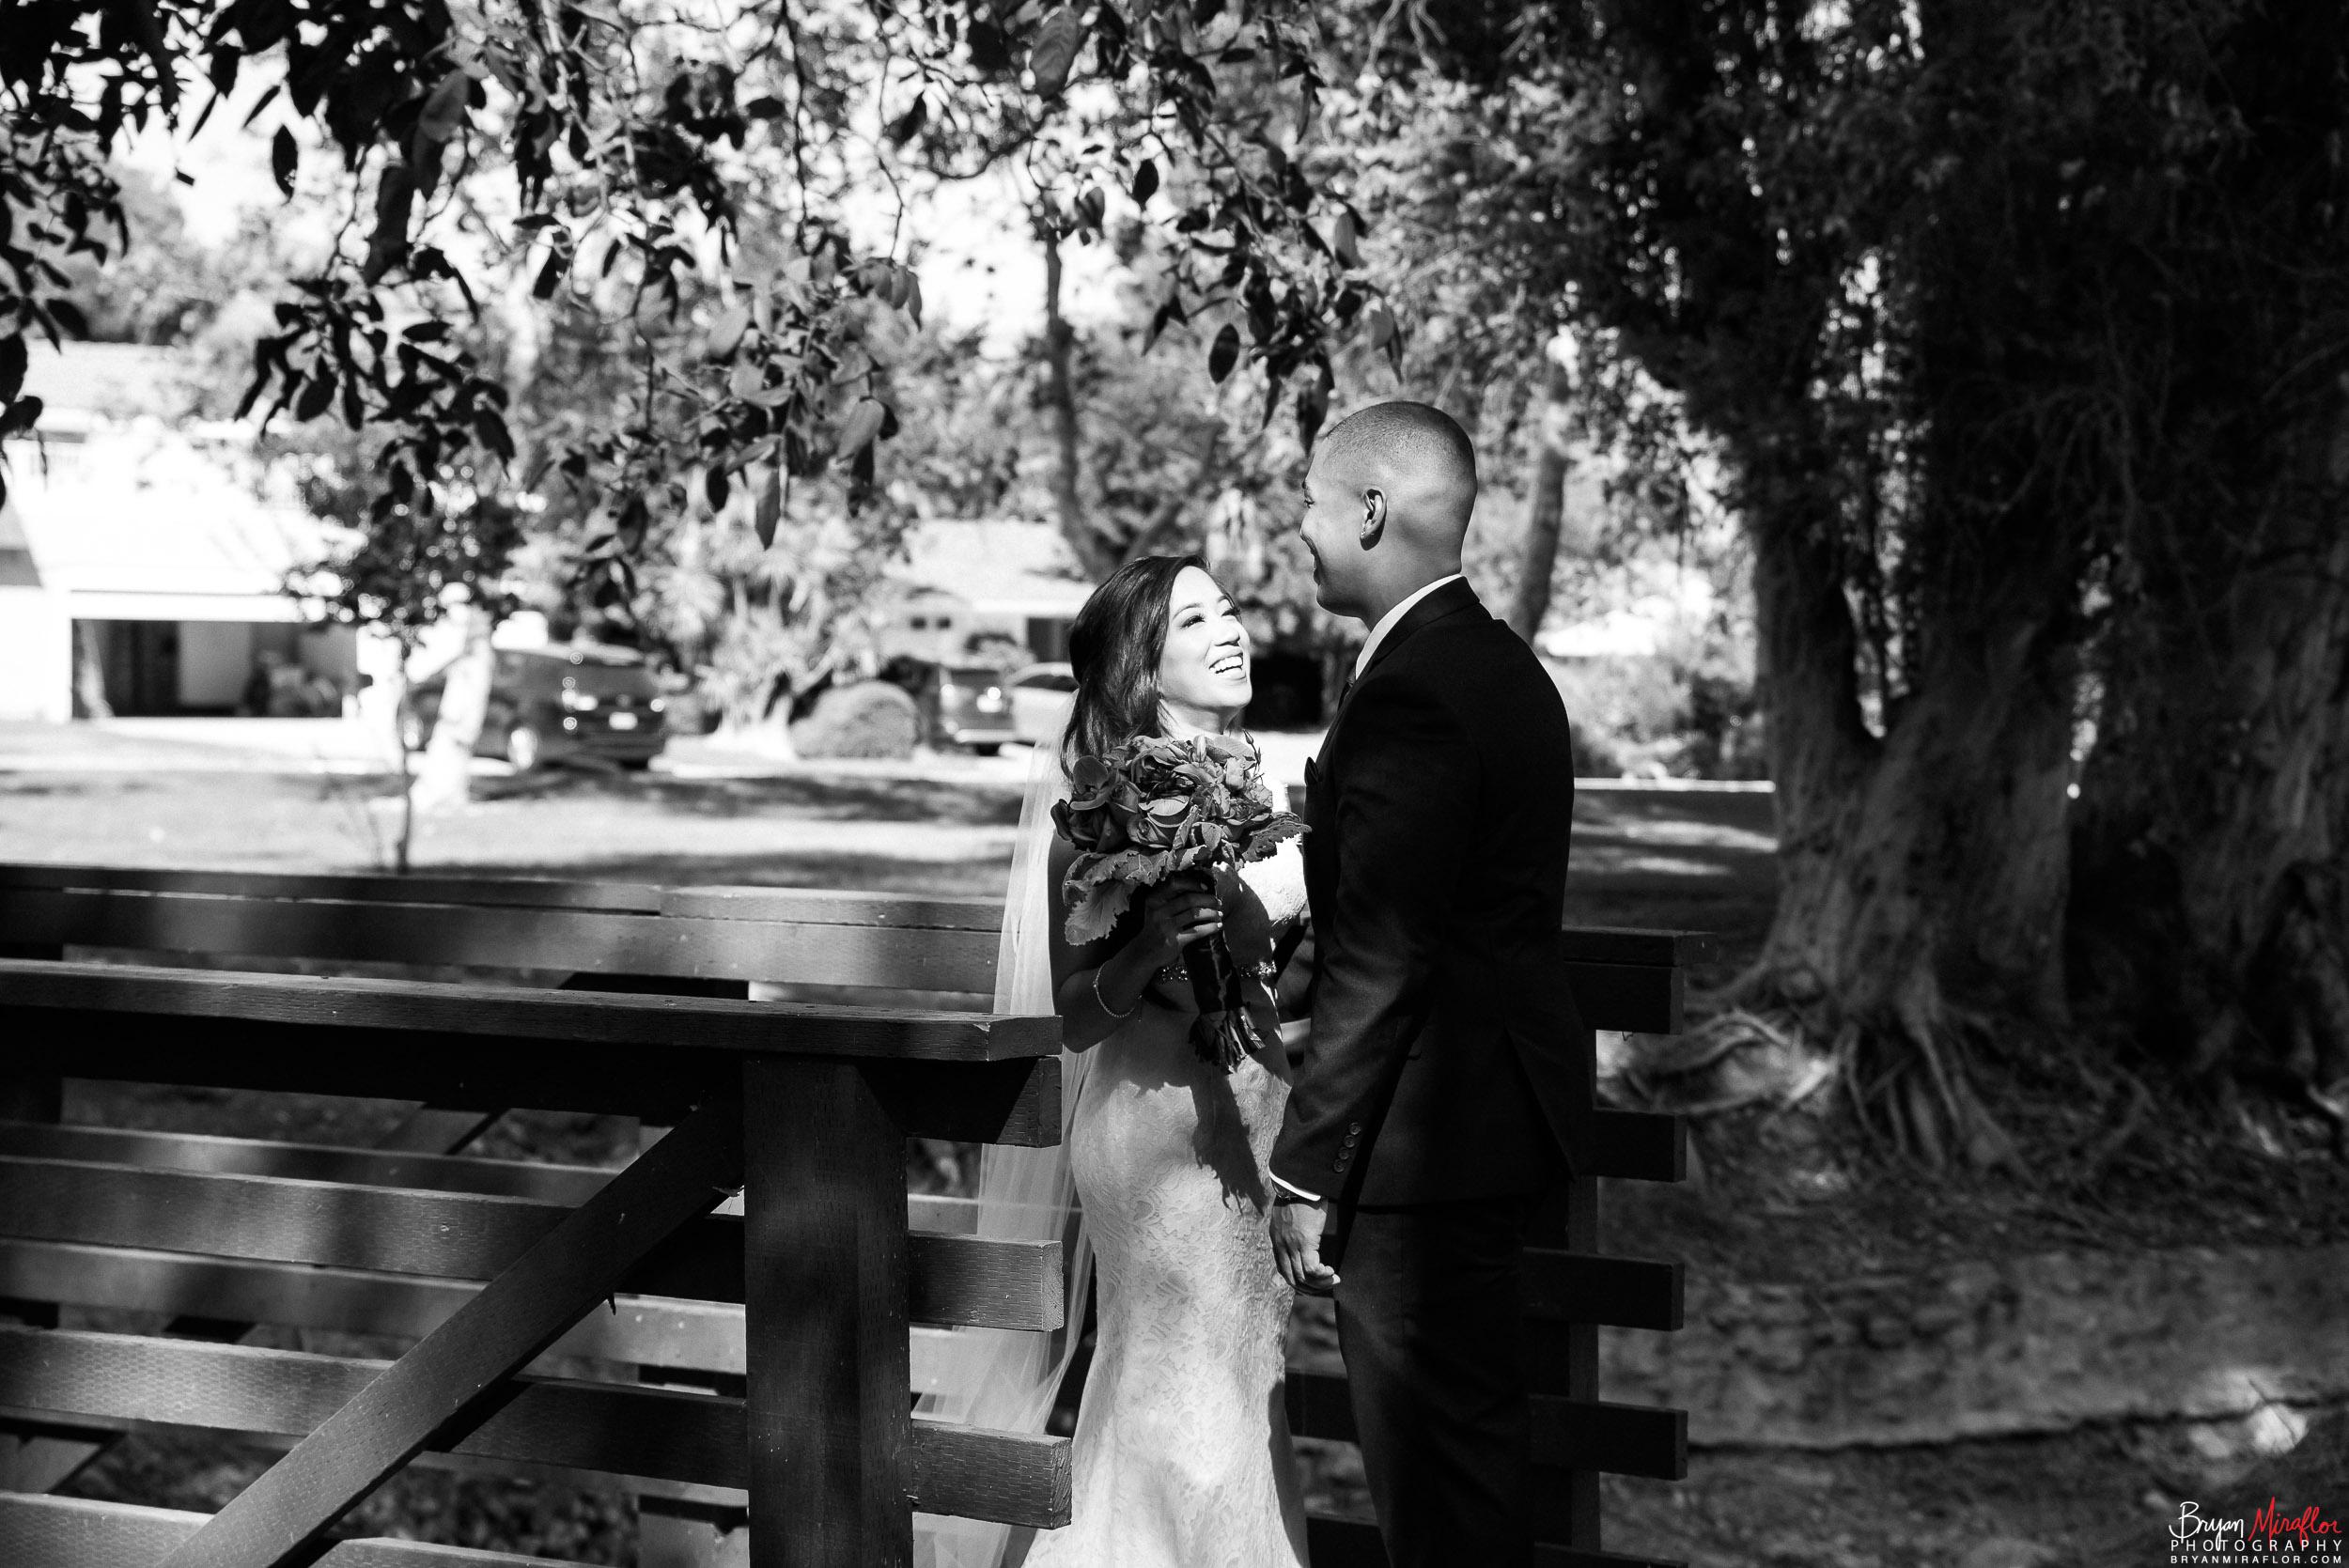 Bryan-Miraflor-Photography-Trisha-Dexter-Married-20170923-022.jpg